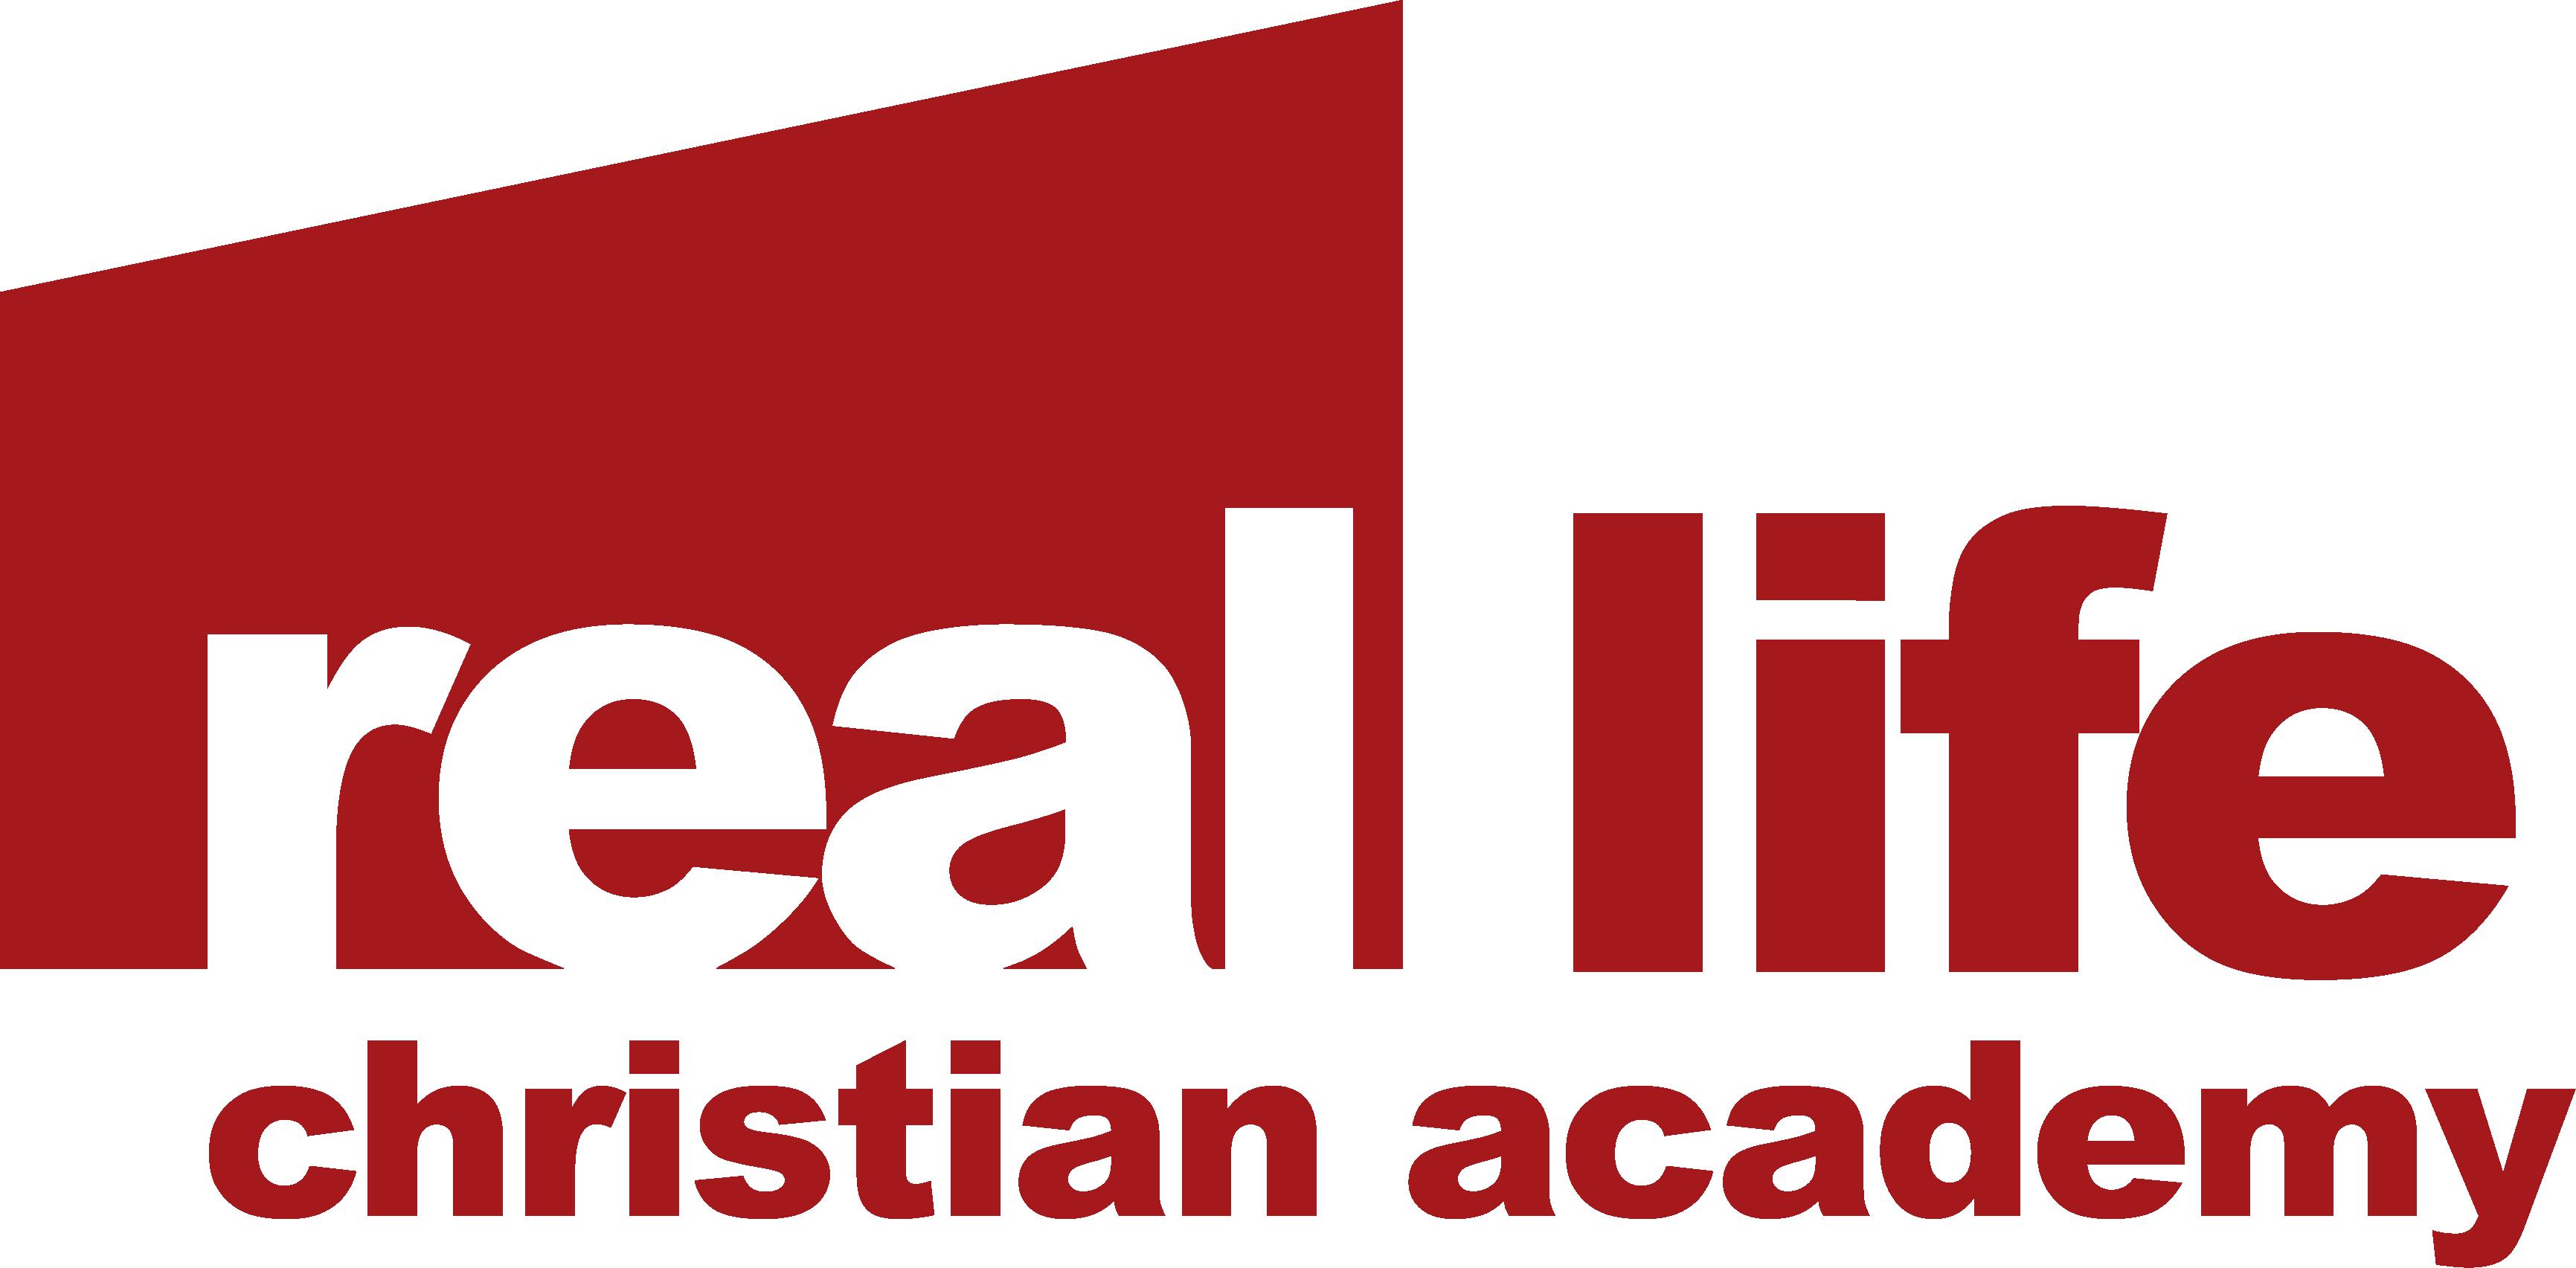 Rlca+logo+red